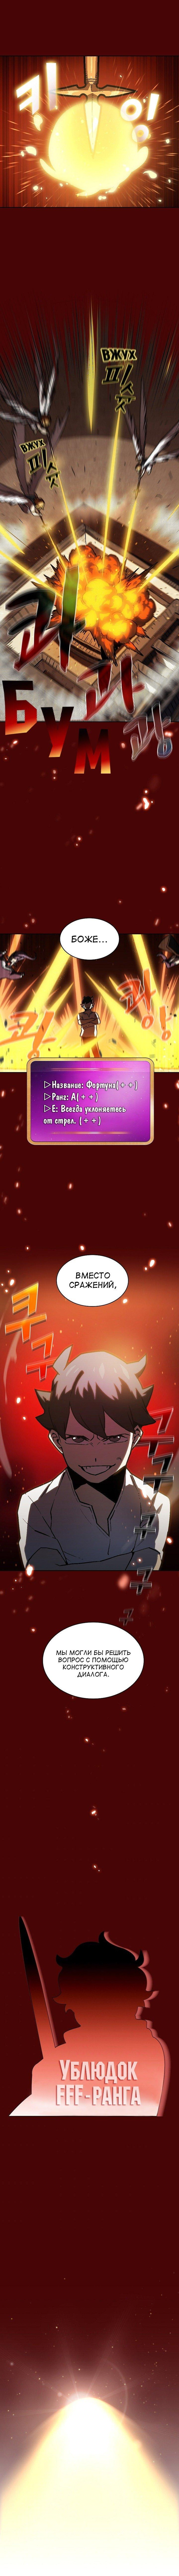 Манга Ублюдок FFF-ранга - Глава 70 Страница 1